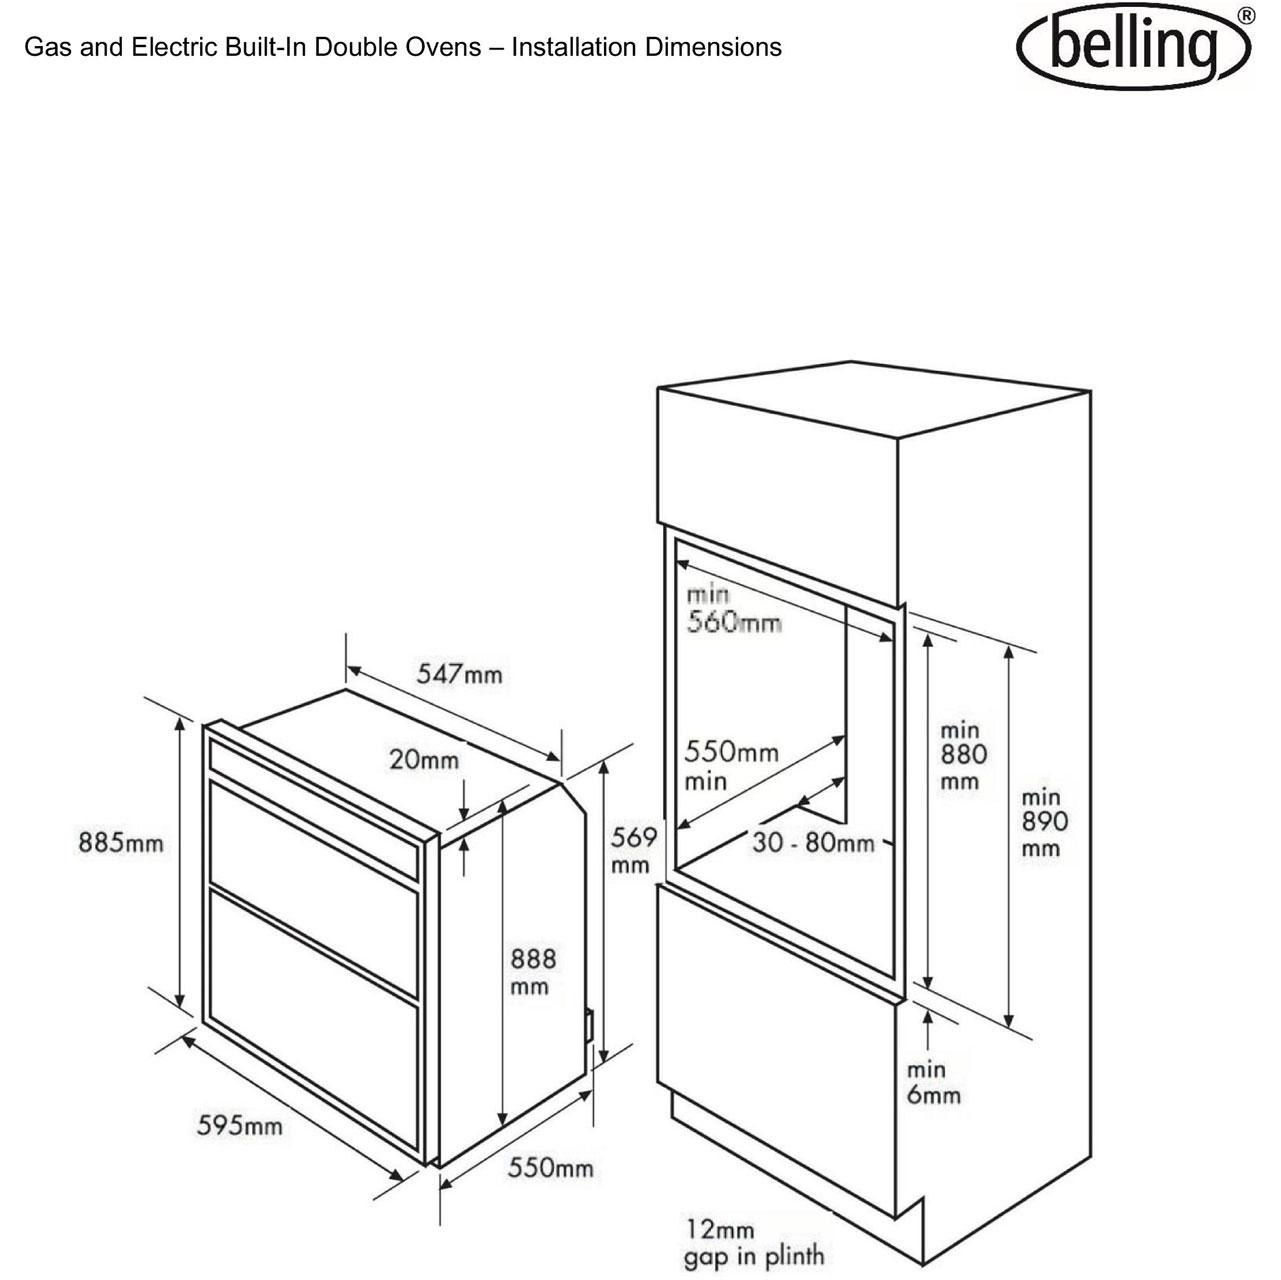 Bi90fp bk belling doubleoven dim l belling bi90fp built in double oven stainless steel belling cooker wiring diagram at aneh